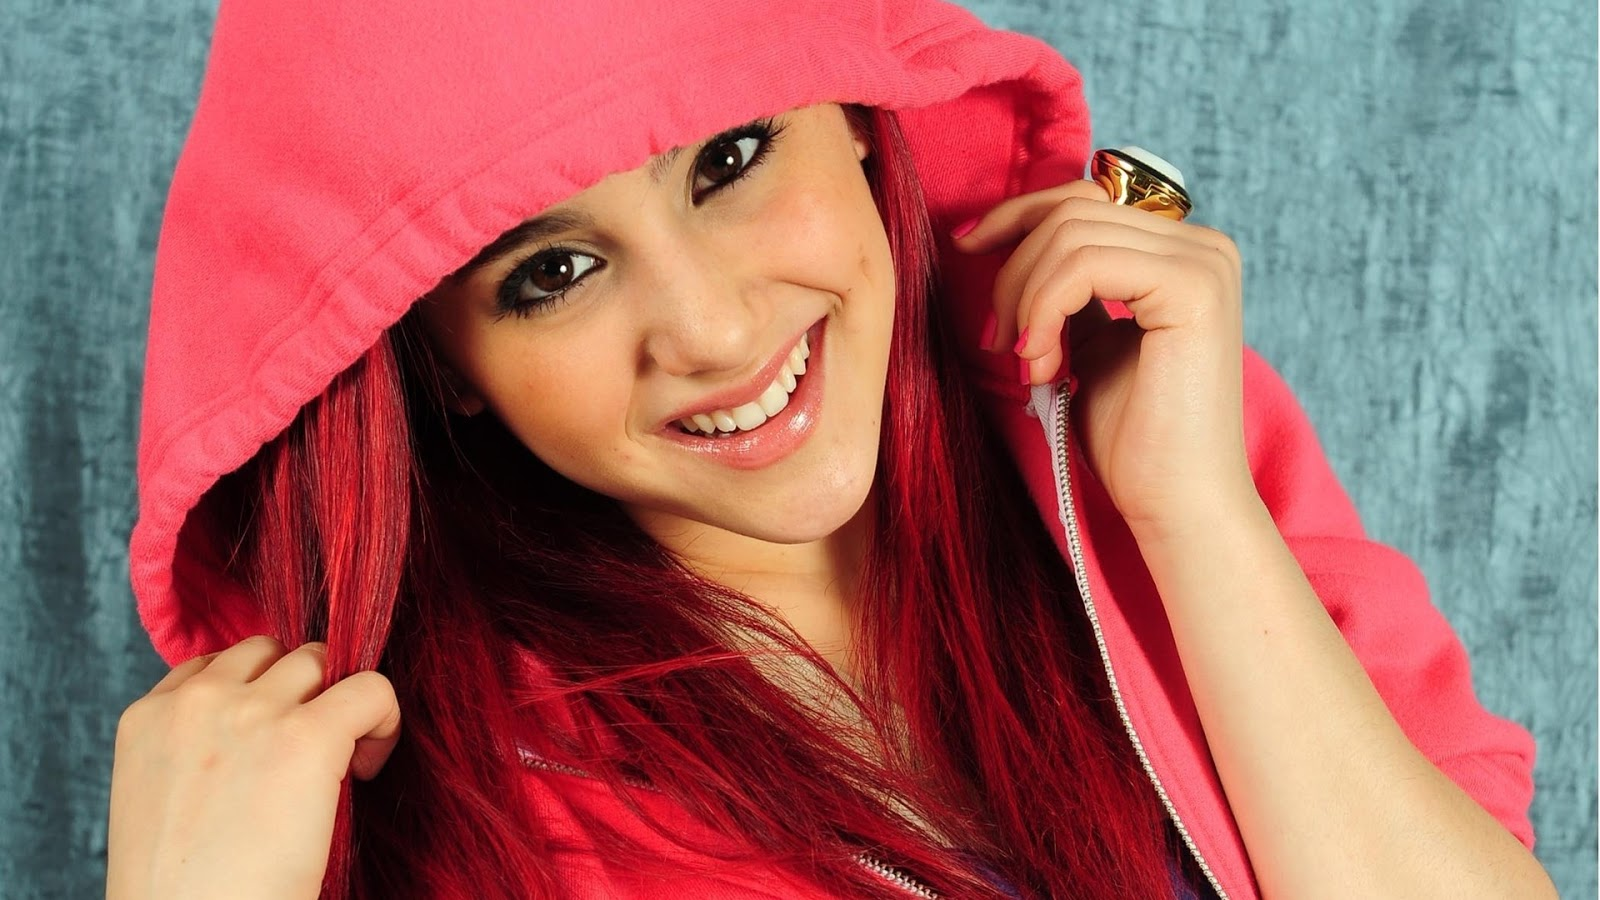 خواننده Ariana Grande Hot: Ariana Grande Hot